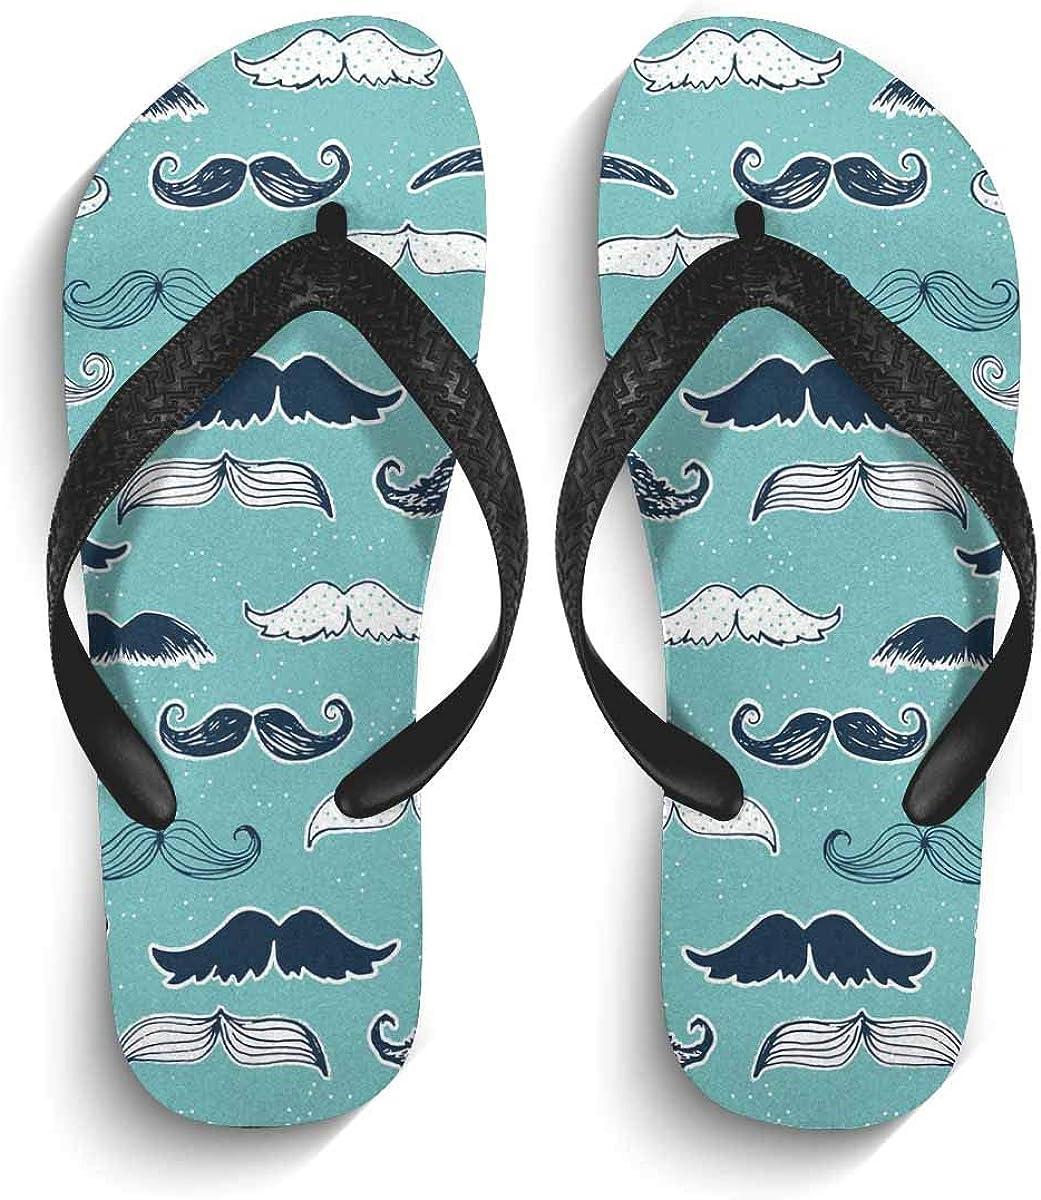 InterestPrint Non-Slip Flip Flops Sandal Cute Moustache Repeat Background Wallpaper Lightweight Summer Beach Thong Slippers for Men M